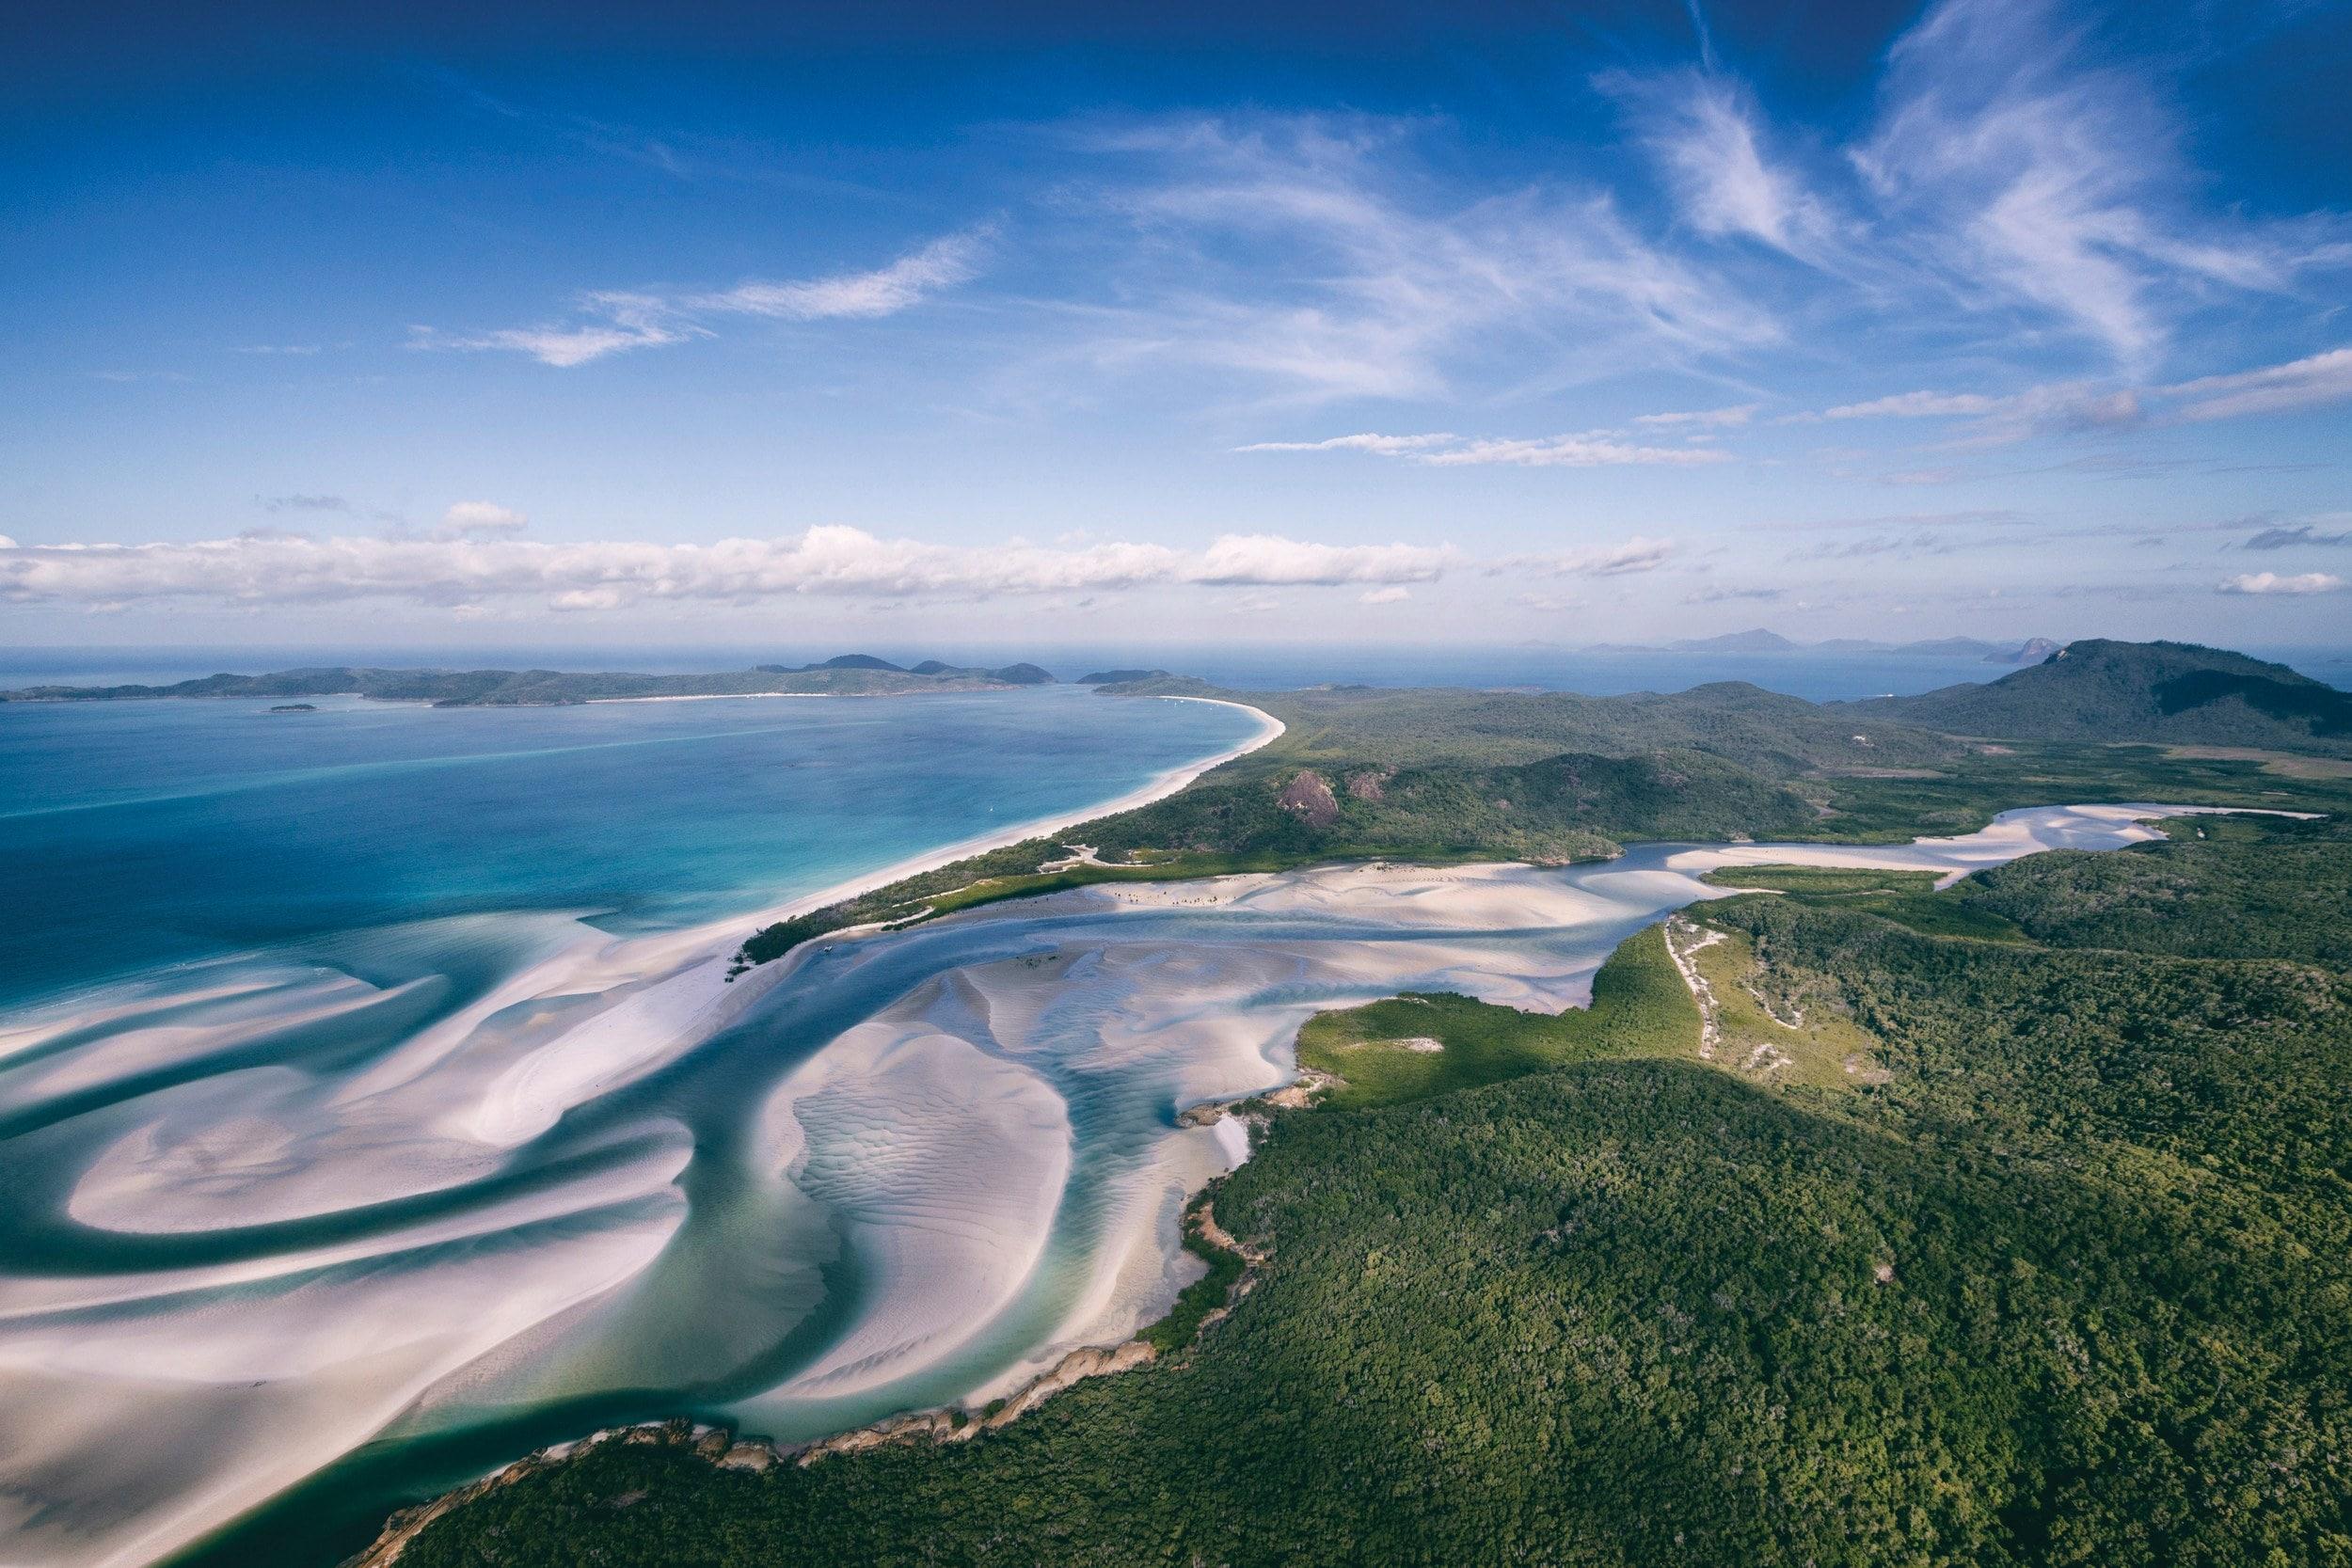 Whitsundays beaches